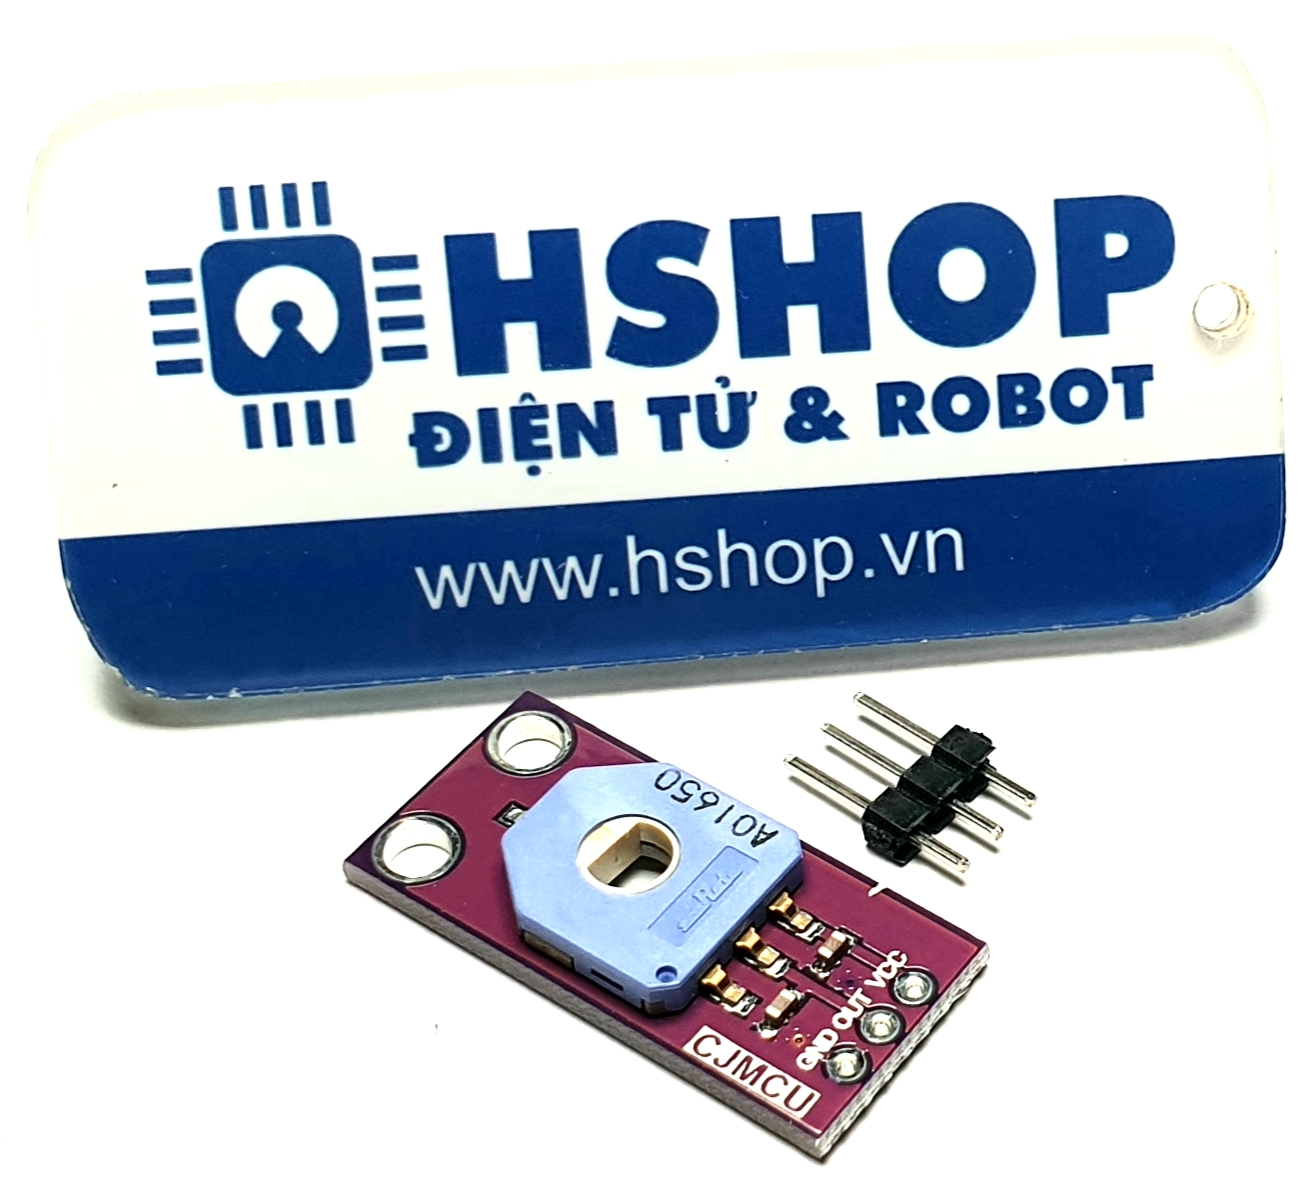 Cảm biến góc xoay SV01A103AEA01R00 Analog Rotation Angle Sensor